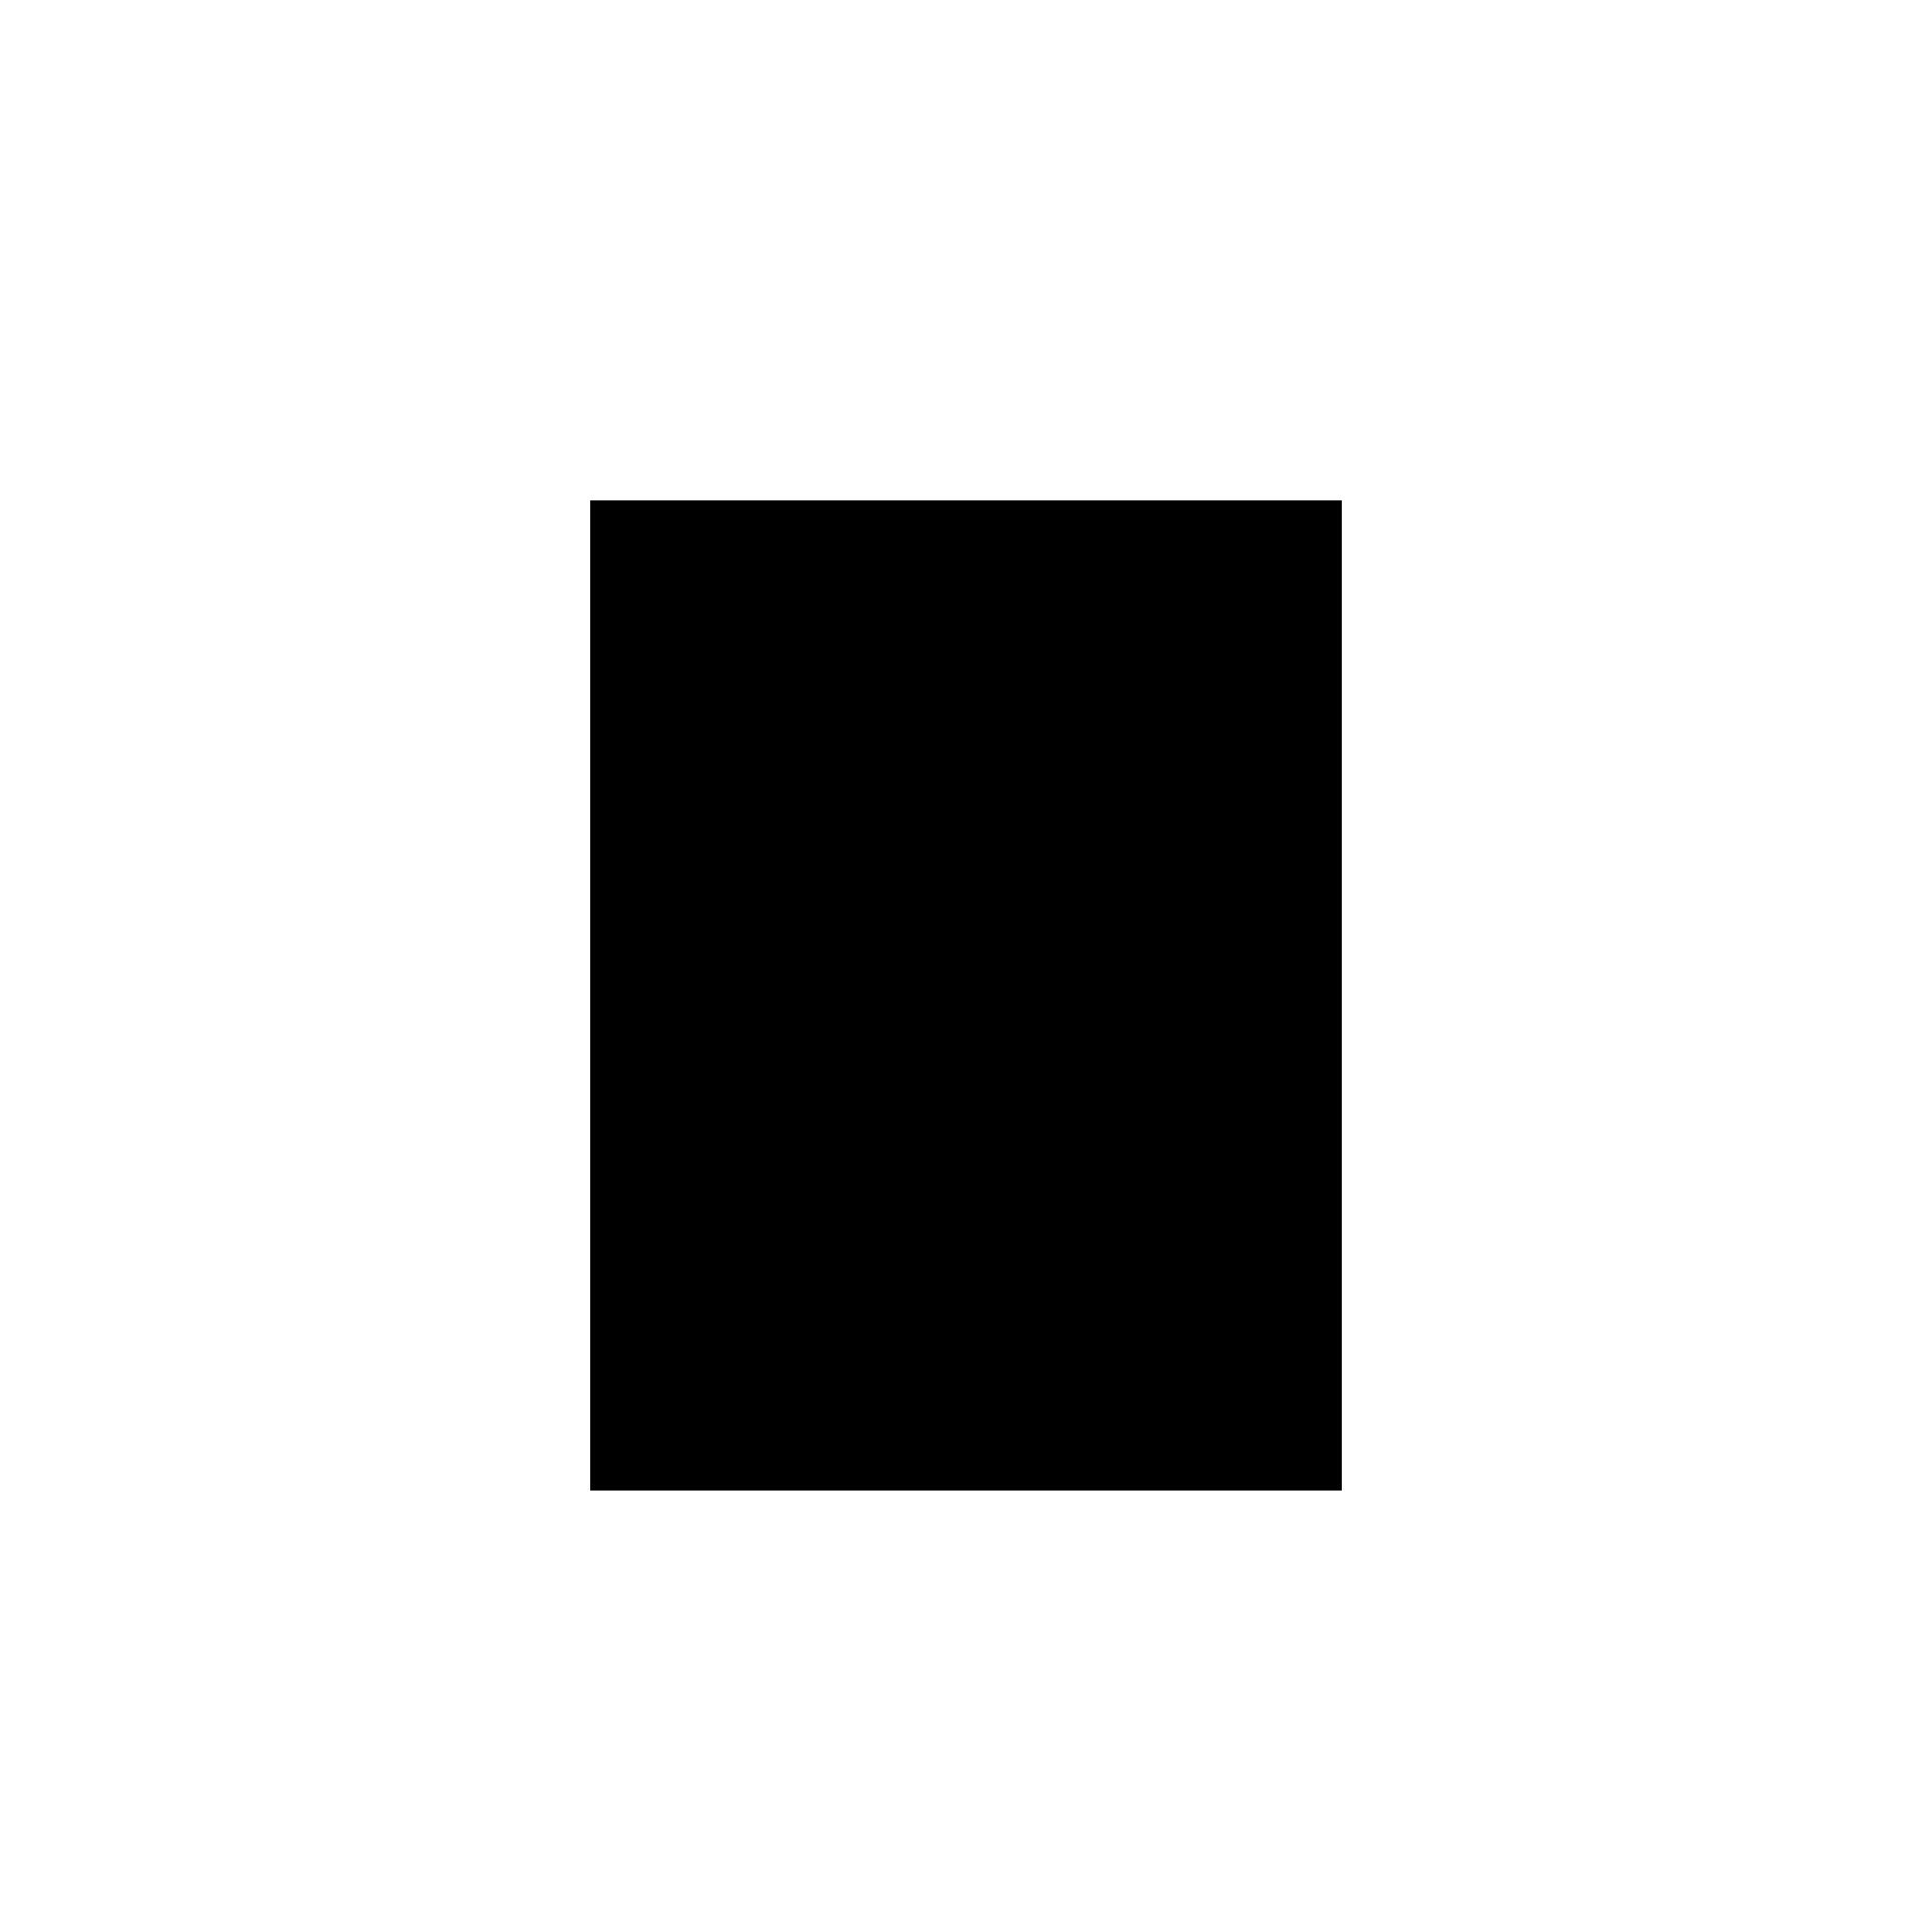 INFRAME-LOGO-white.png